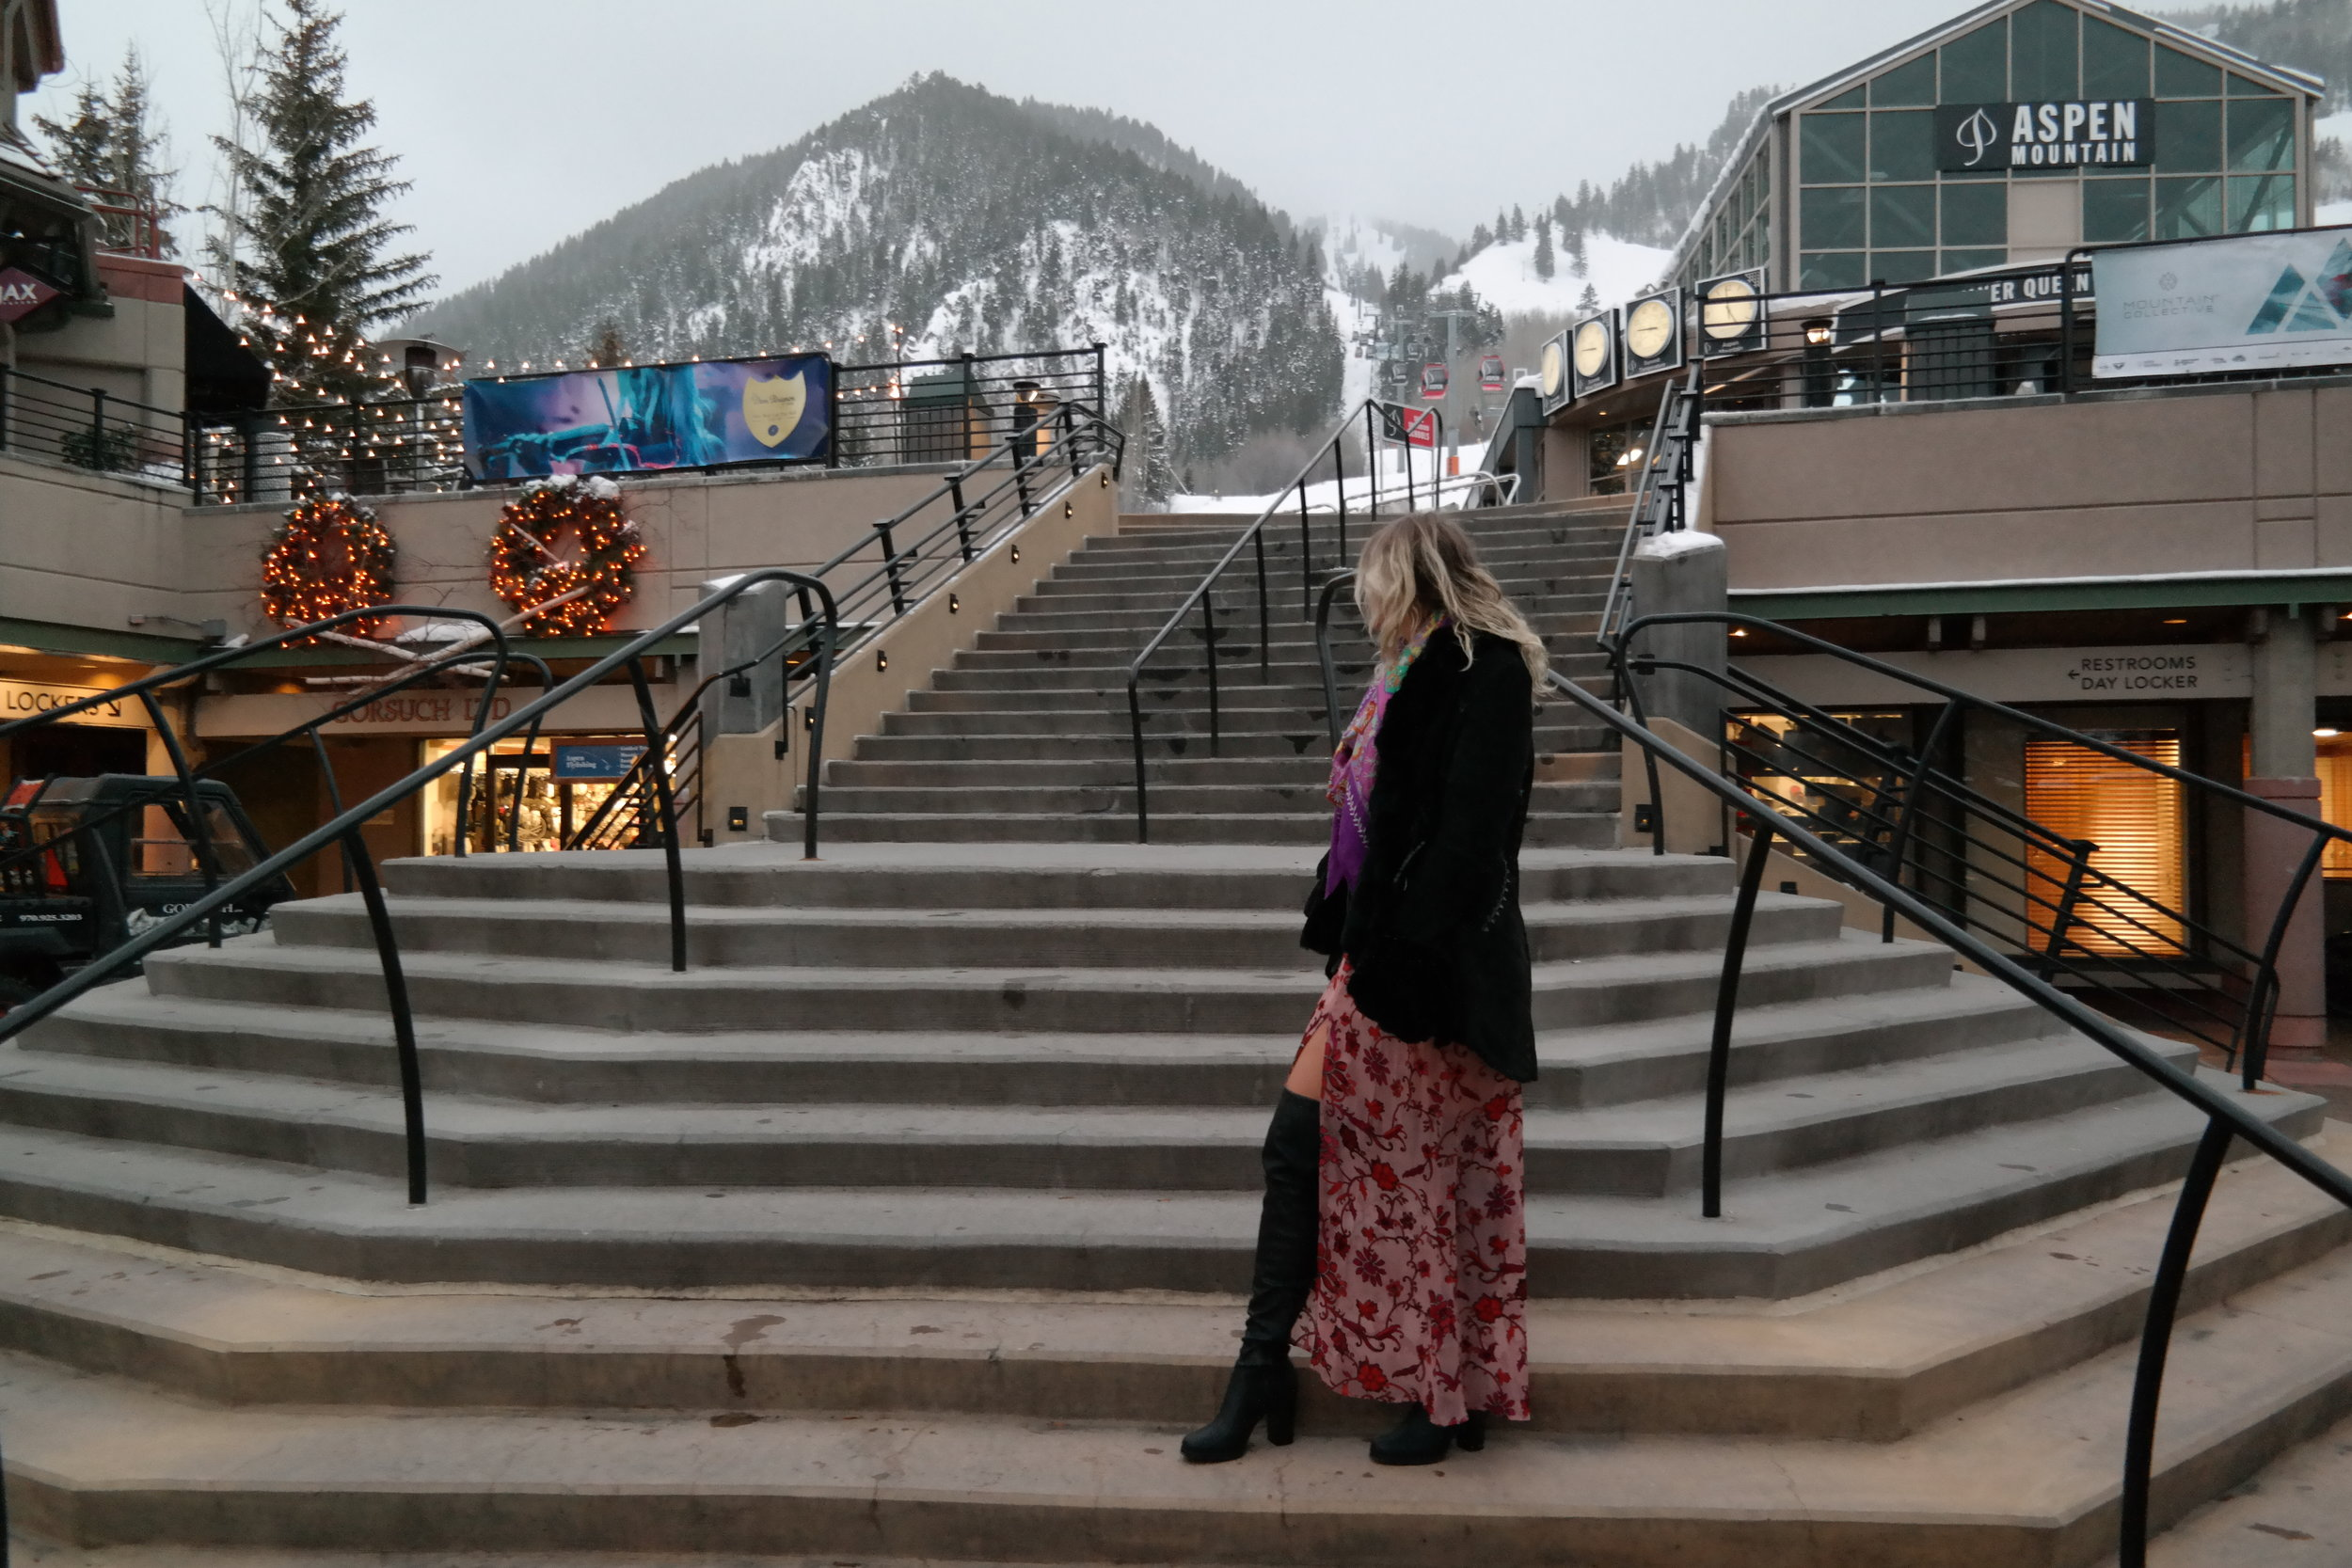 Christmas Eve at Aspen Mountain